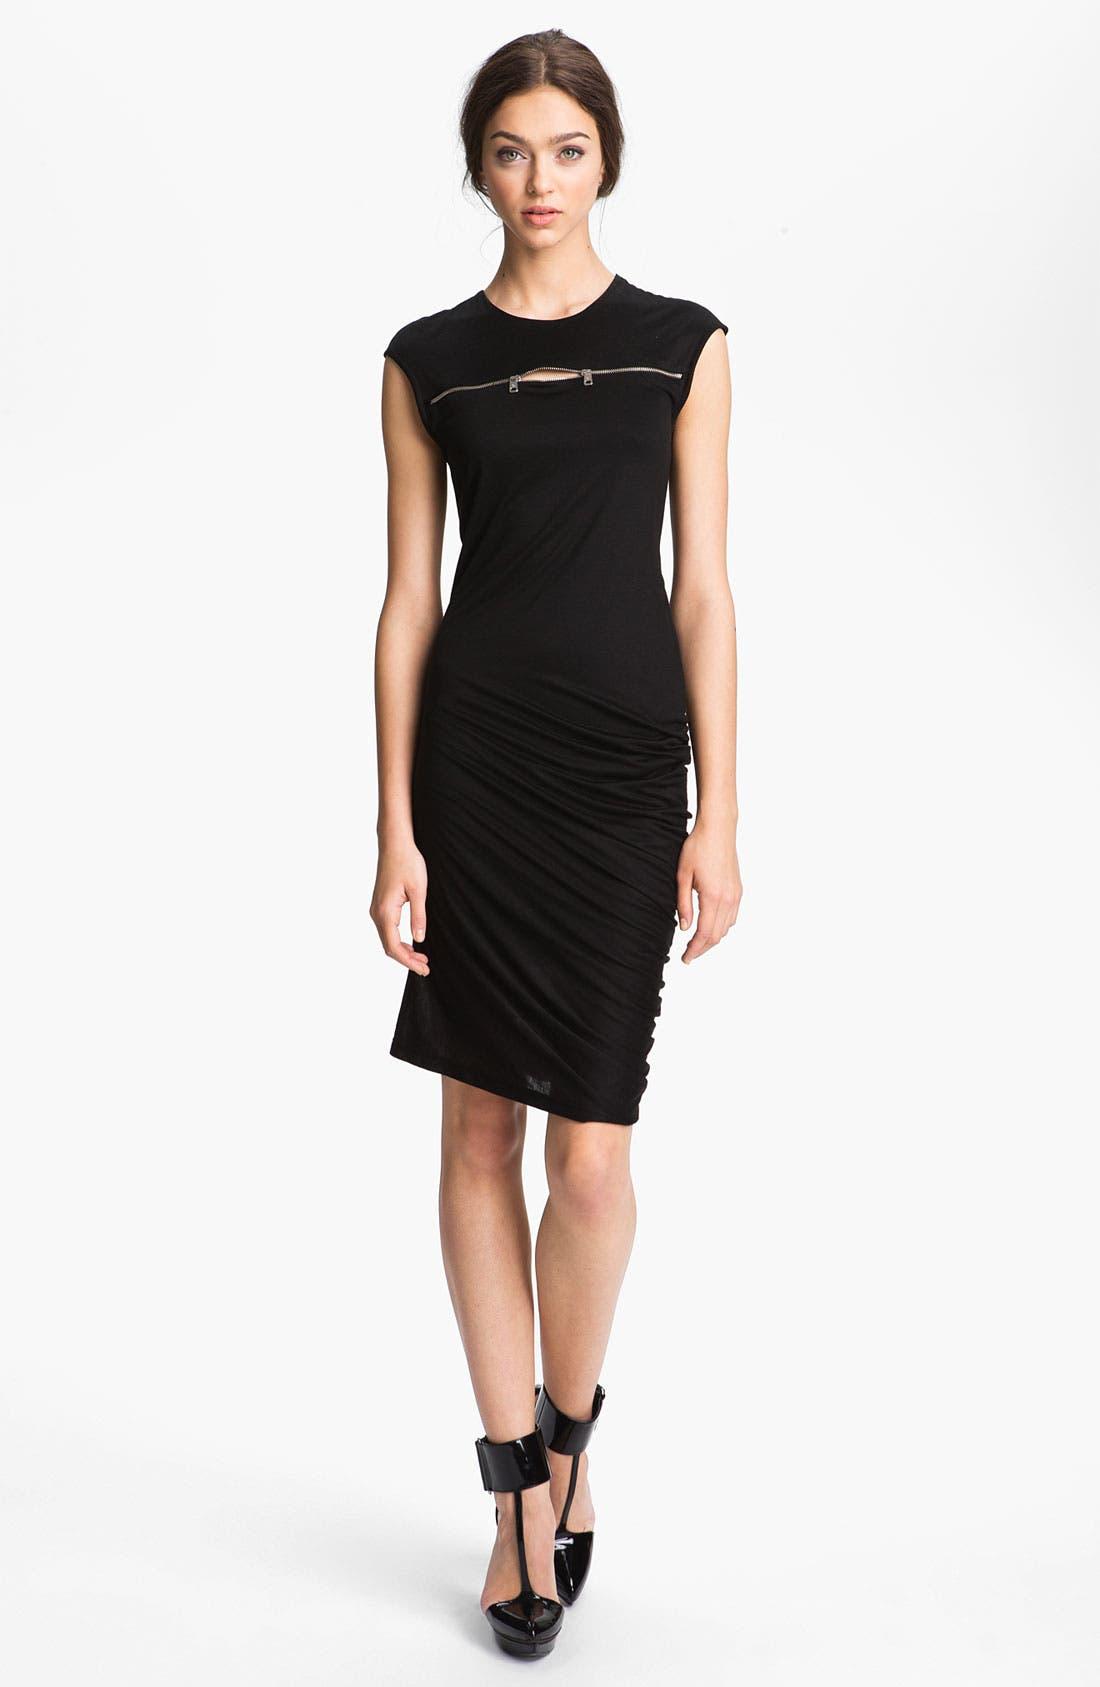 McQ by Alexander McQueen Zip Detail Knit Dress,                         Main,                         color, Black